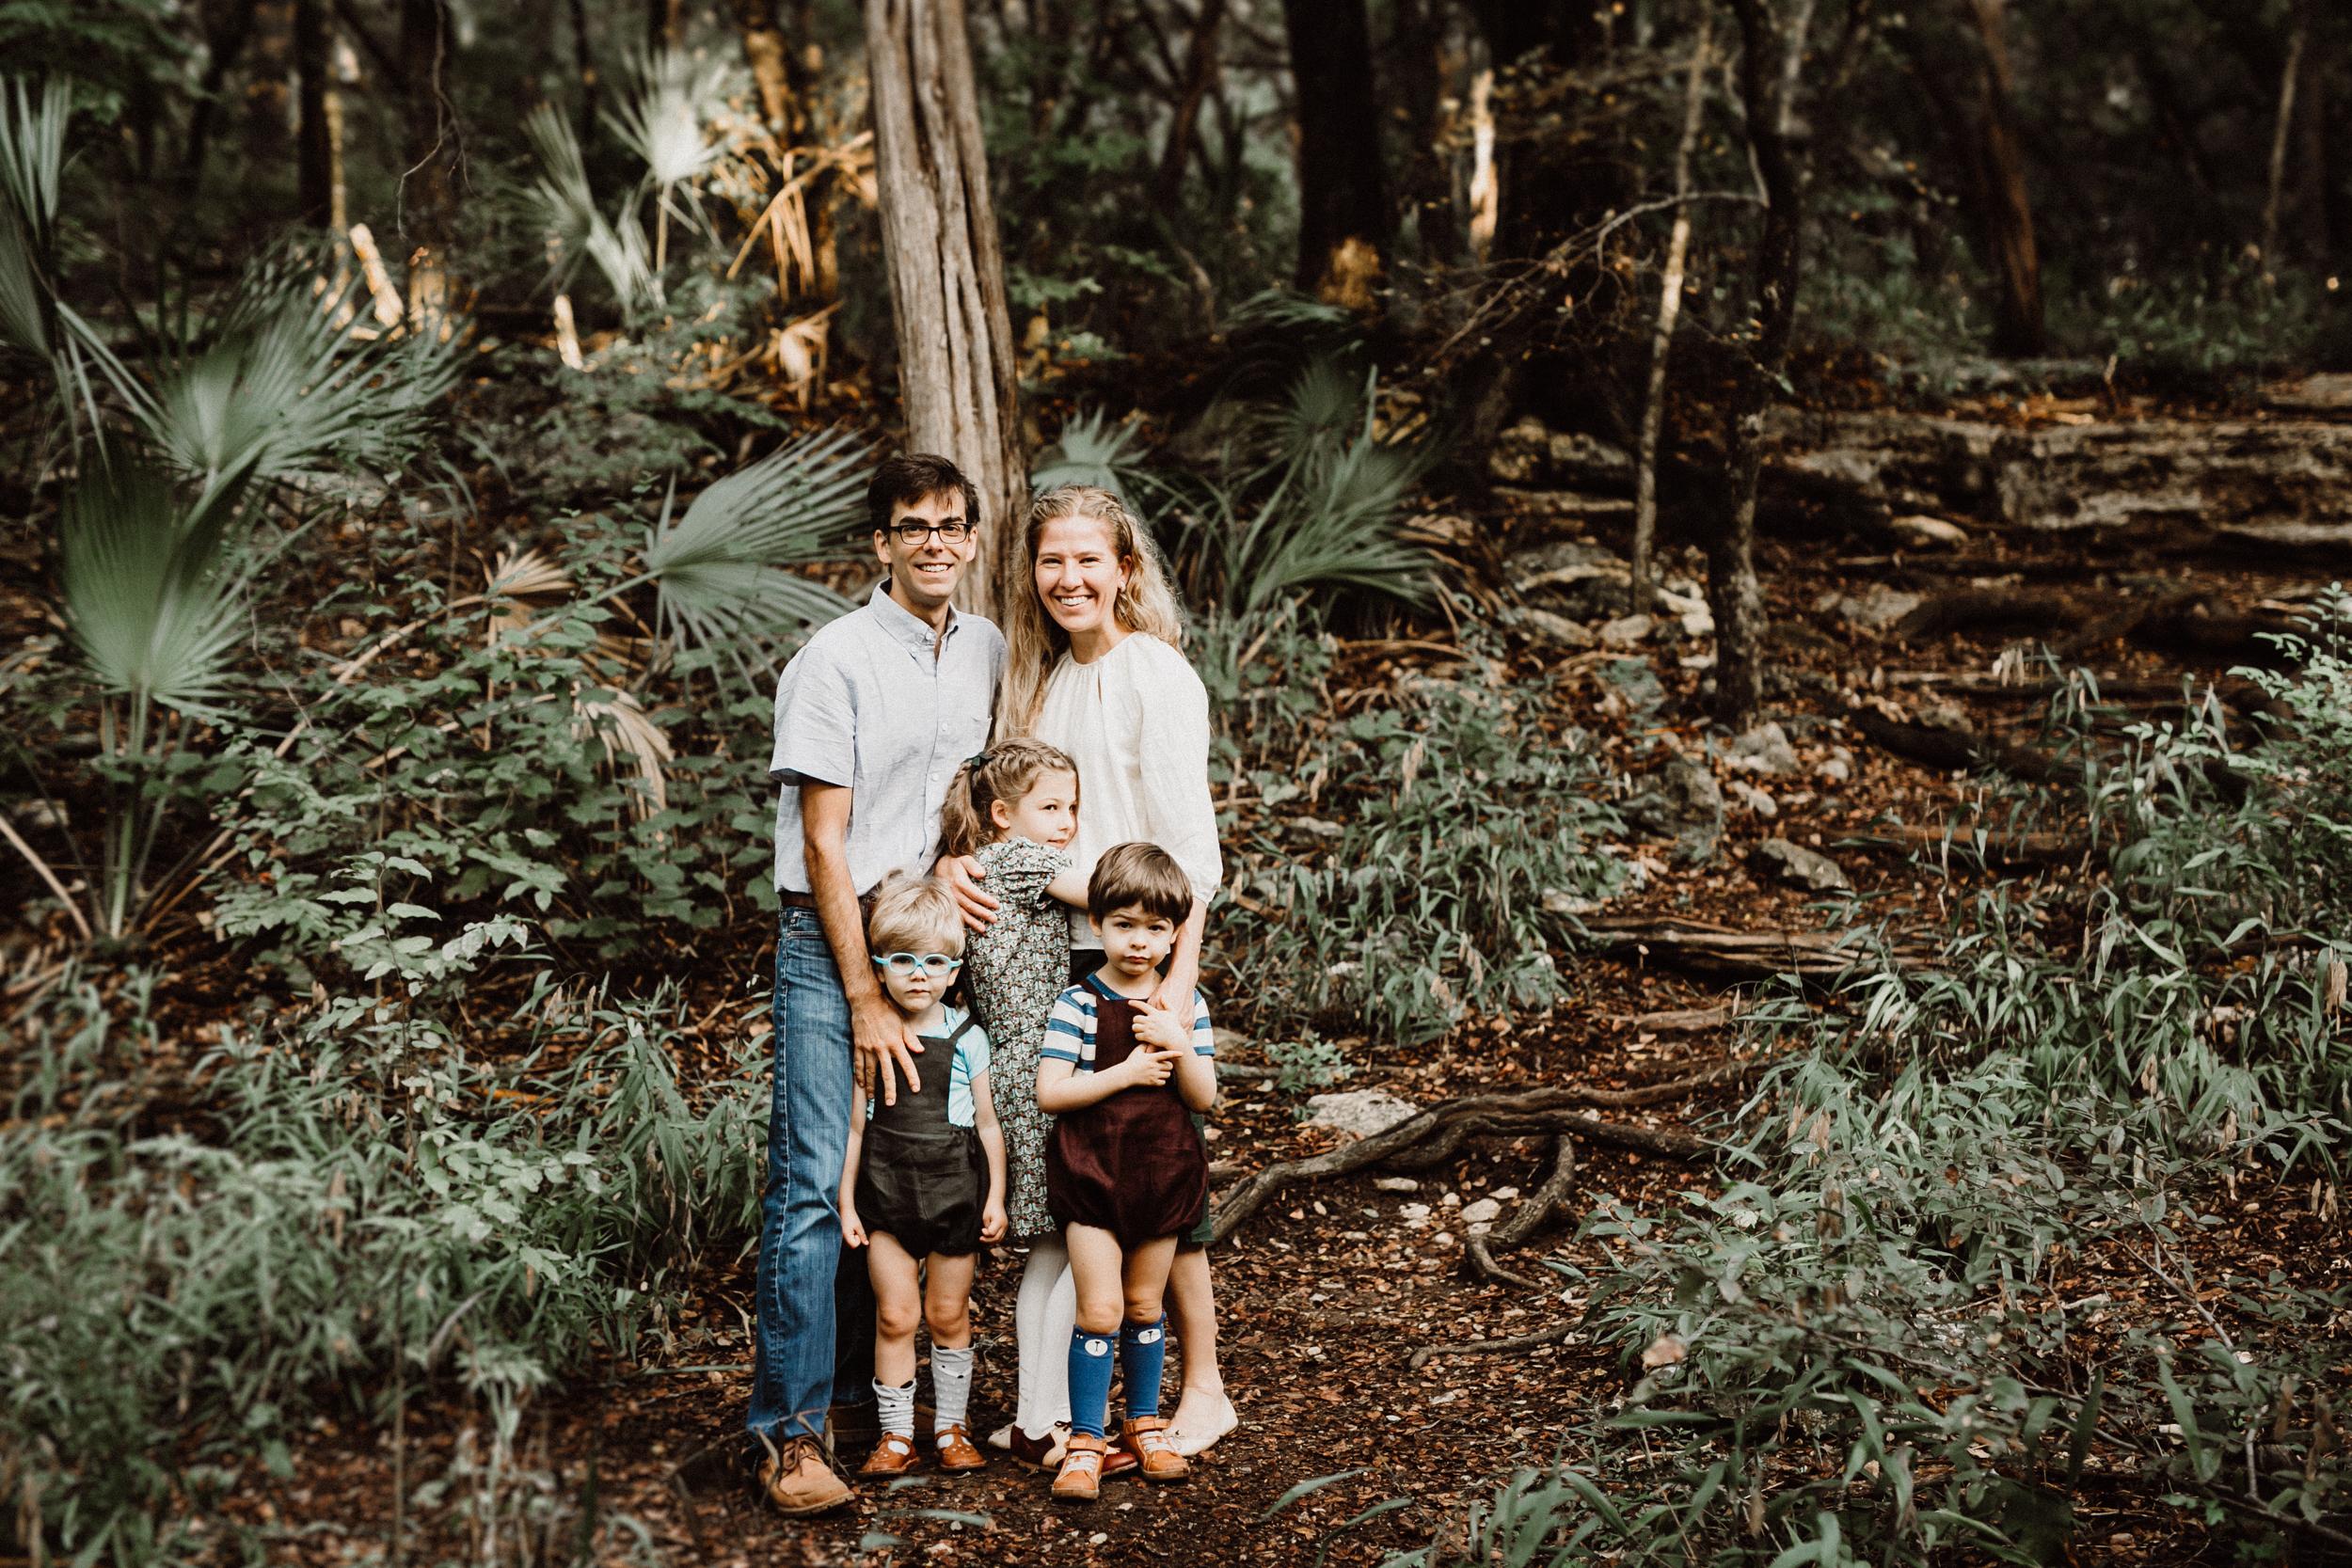 mayfield-park-natural-family-session-senning-93.jpg